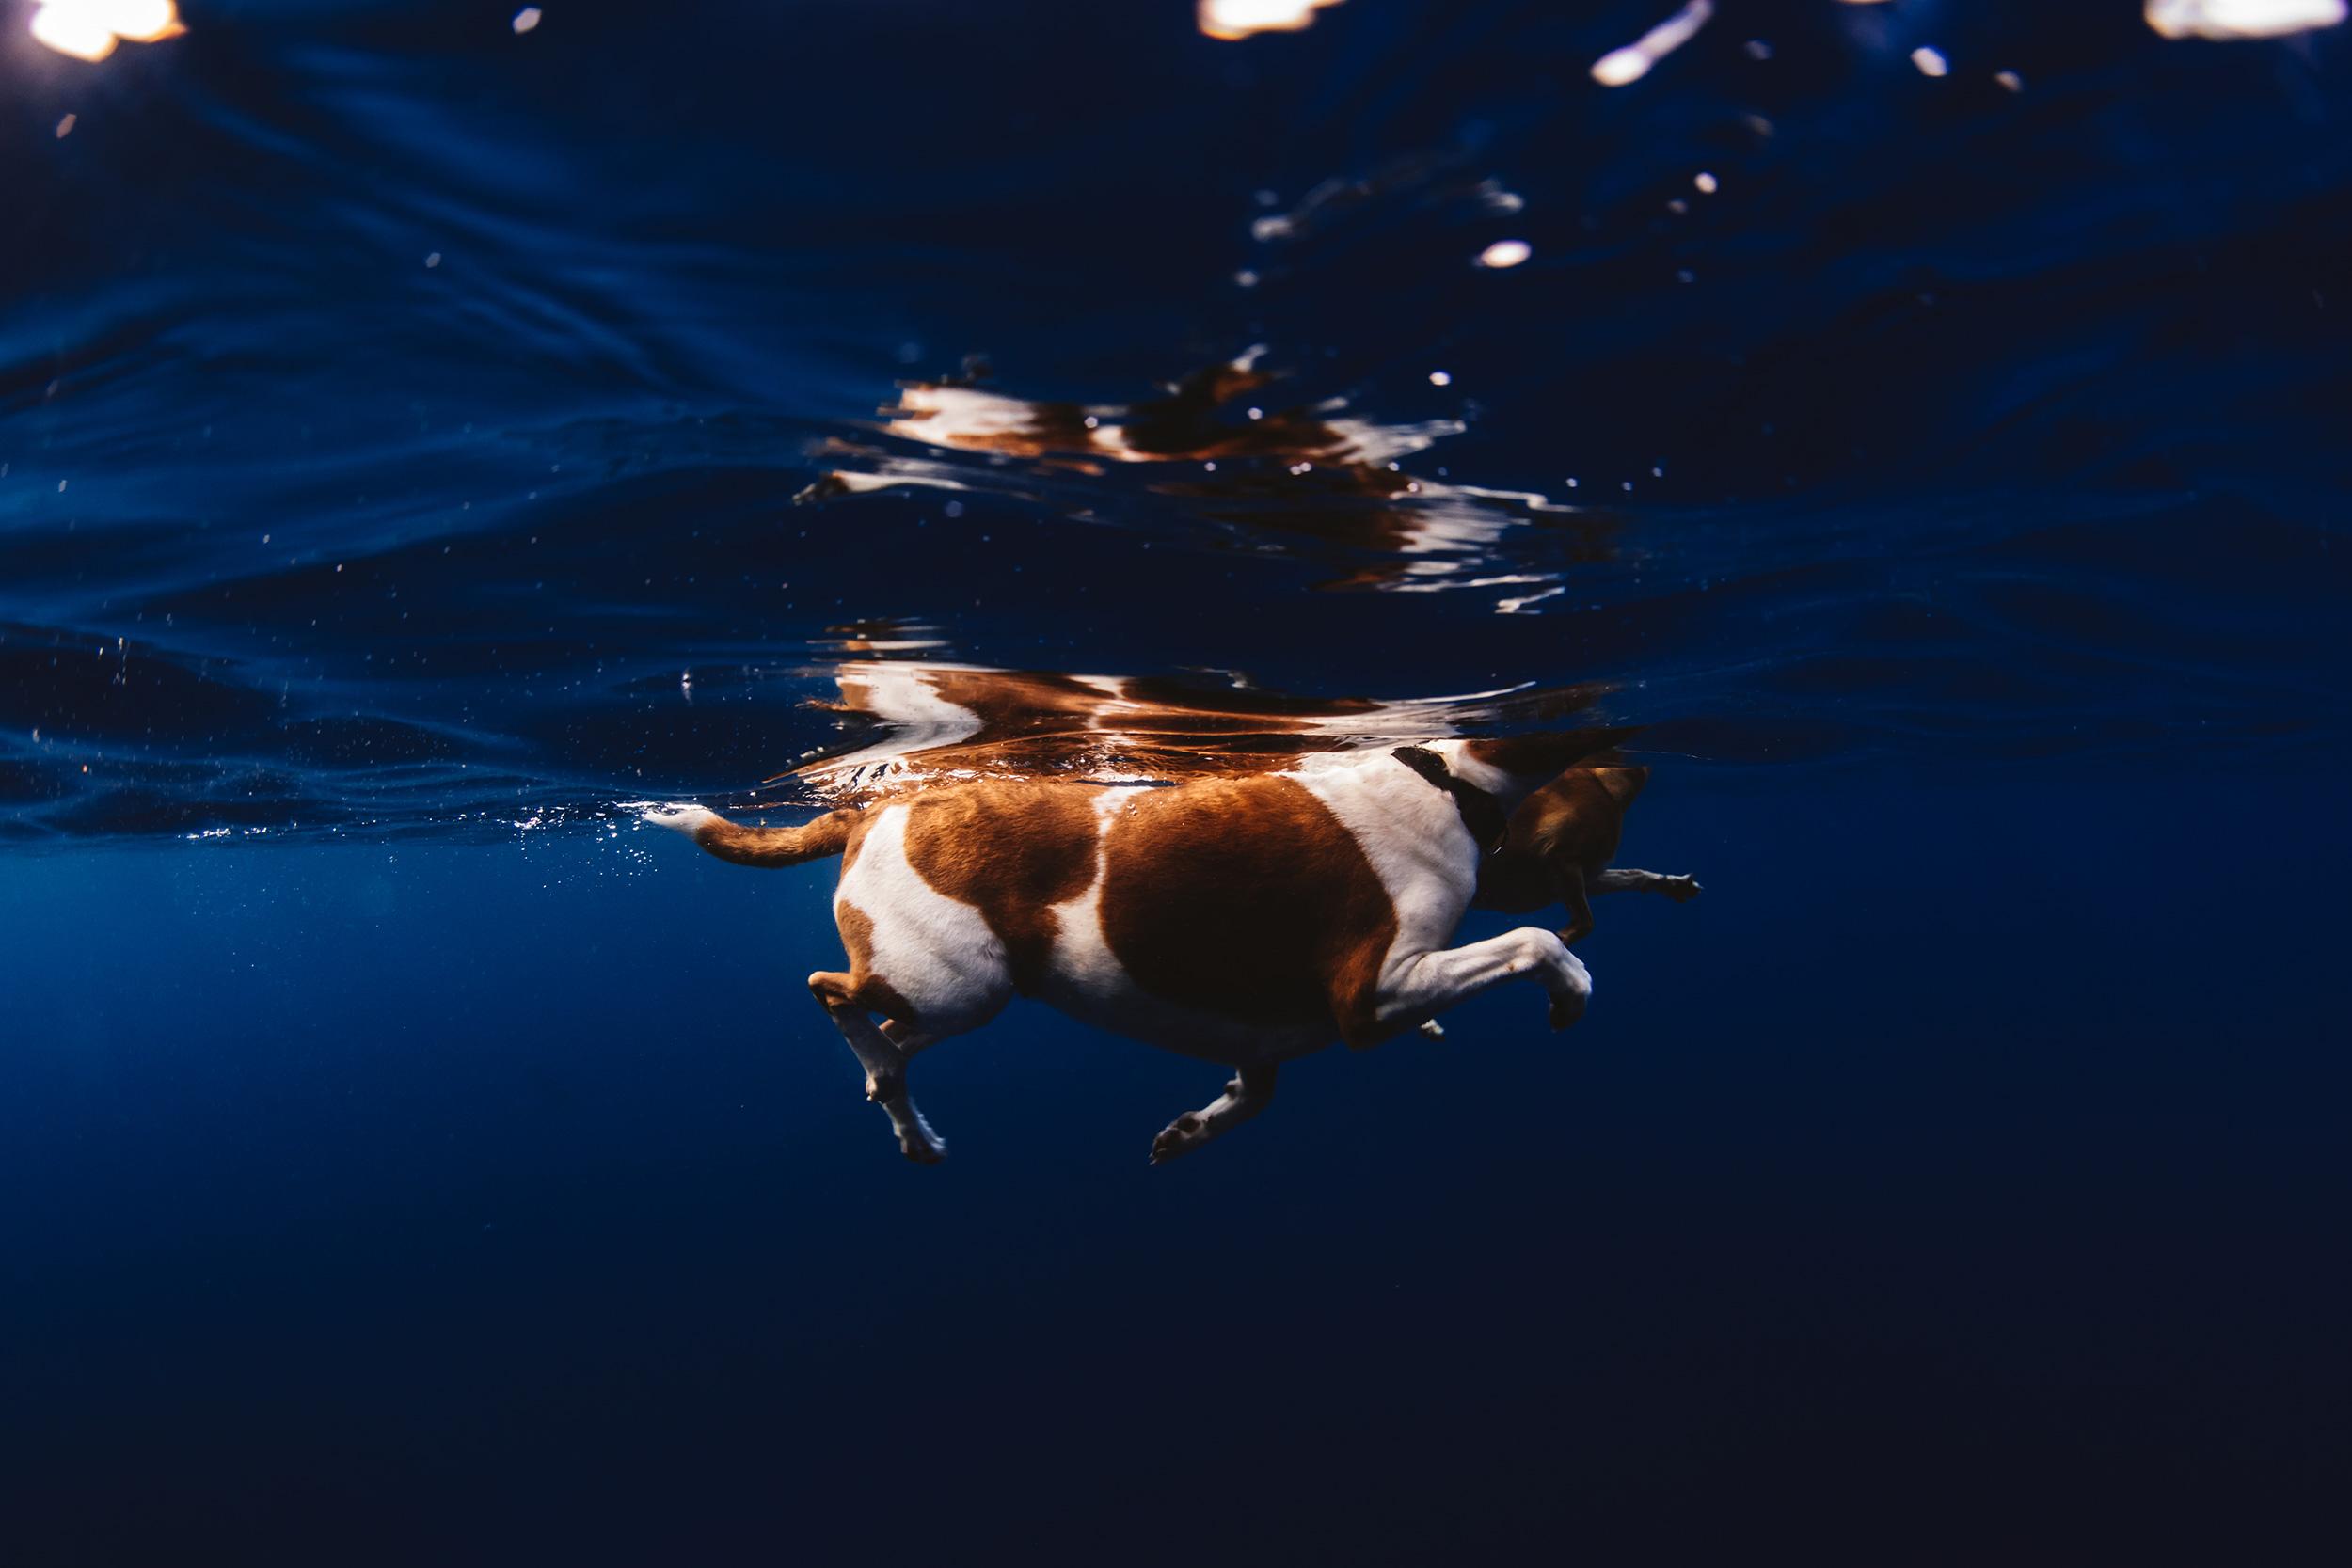 dogs of instagram - ocean culture life